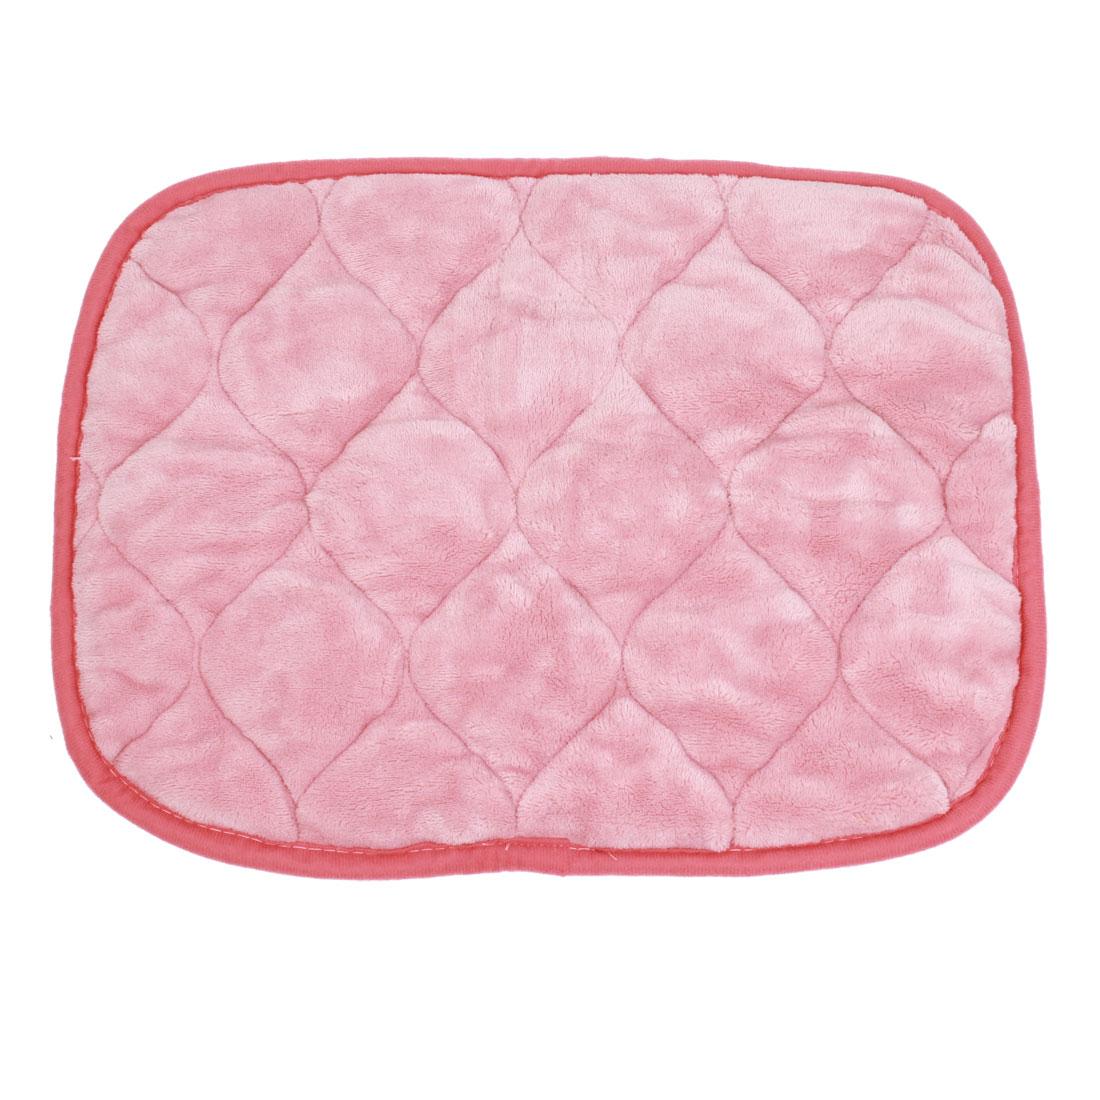 Pink White Coral Fleece Warm Pet Dog Puppy Cushion Pad Mat 45cm x 35cm